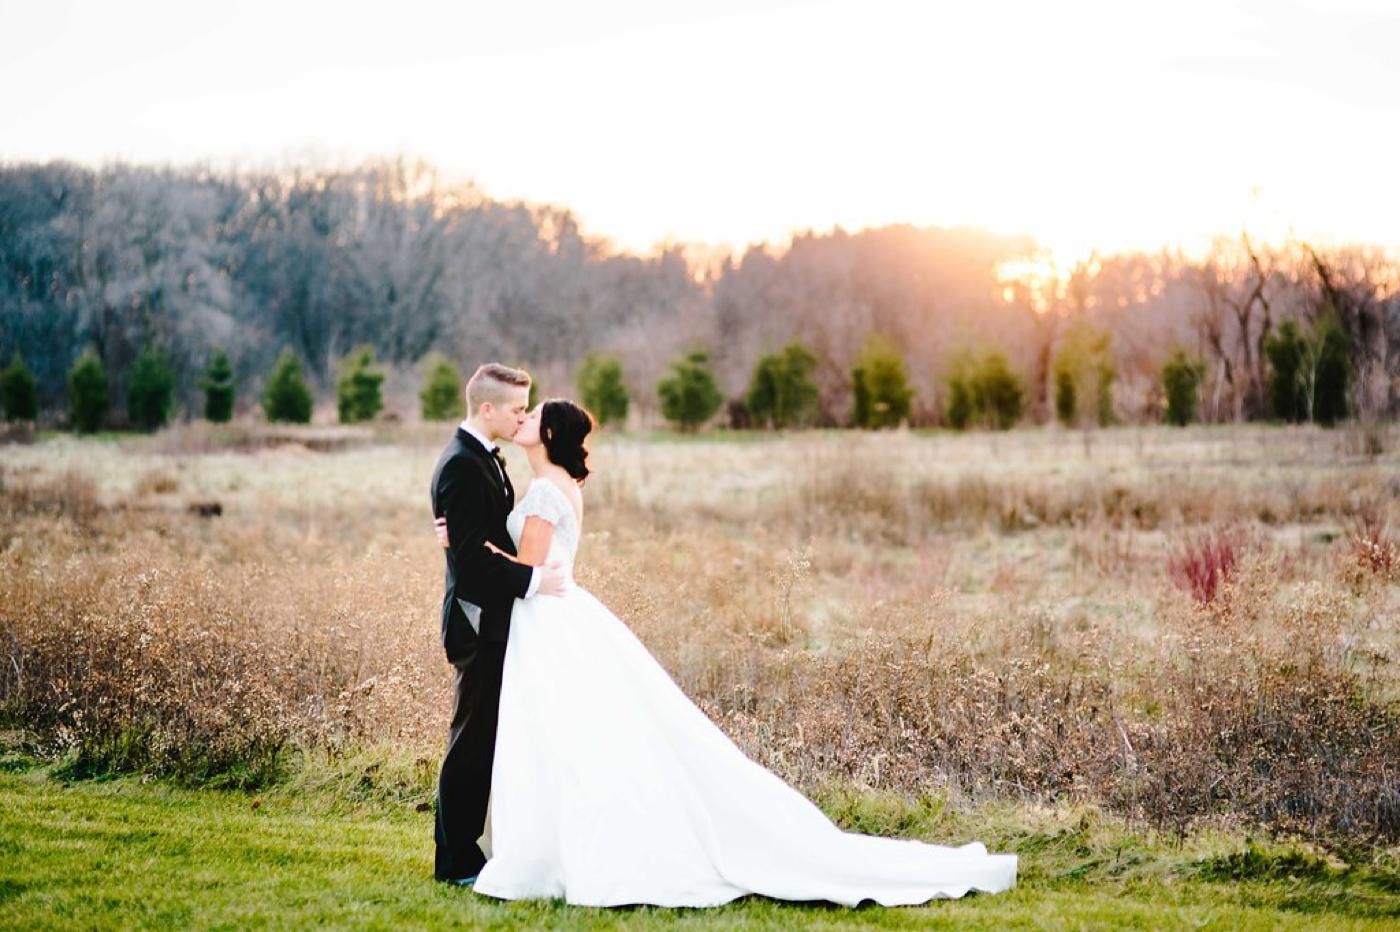 chicago-fine-art-wedding-photography-jacobs18